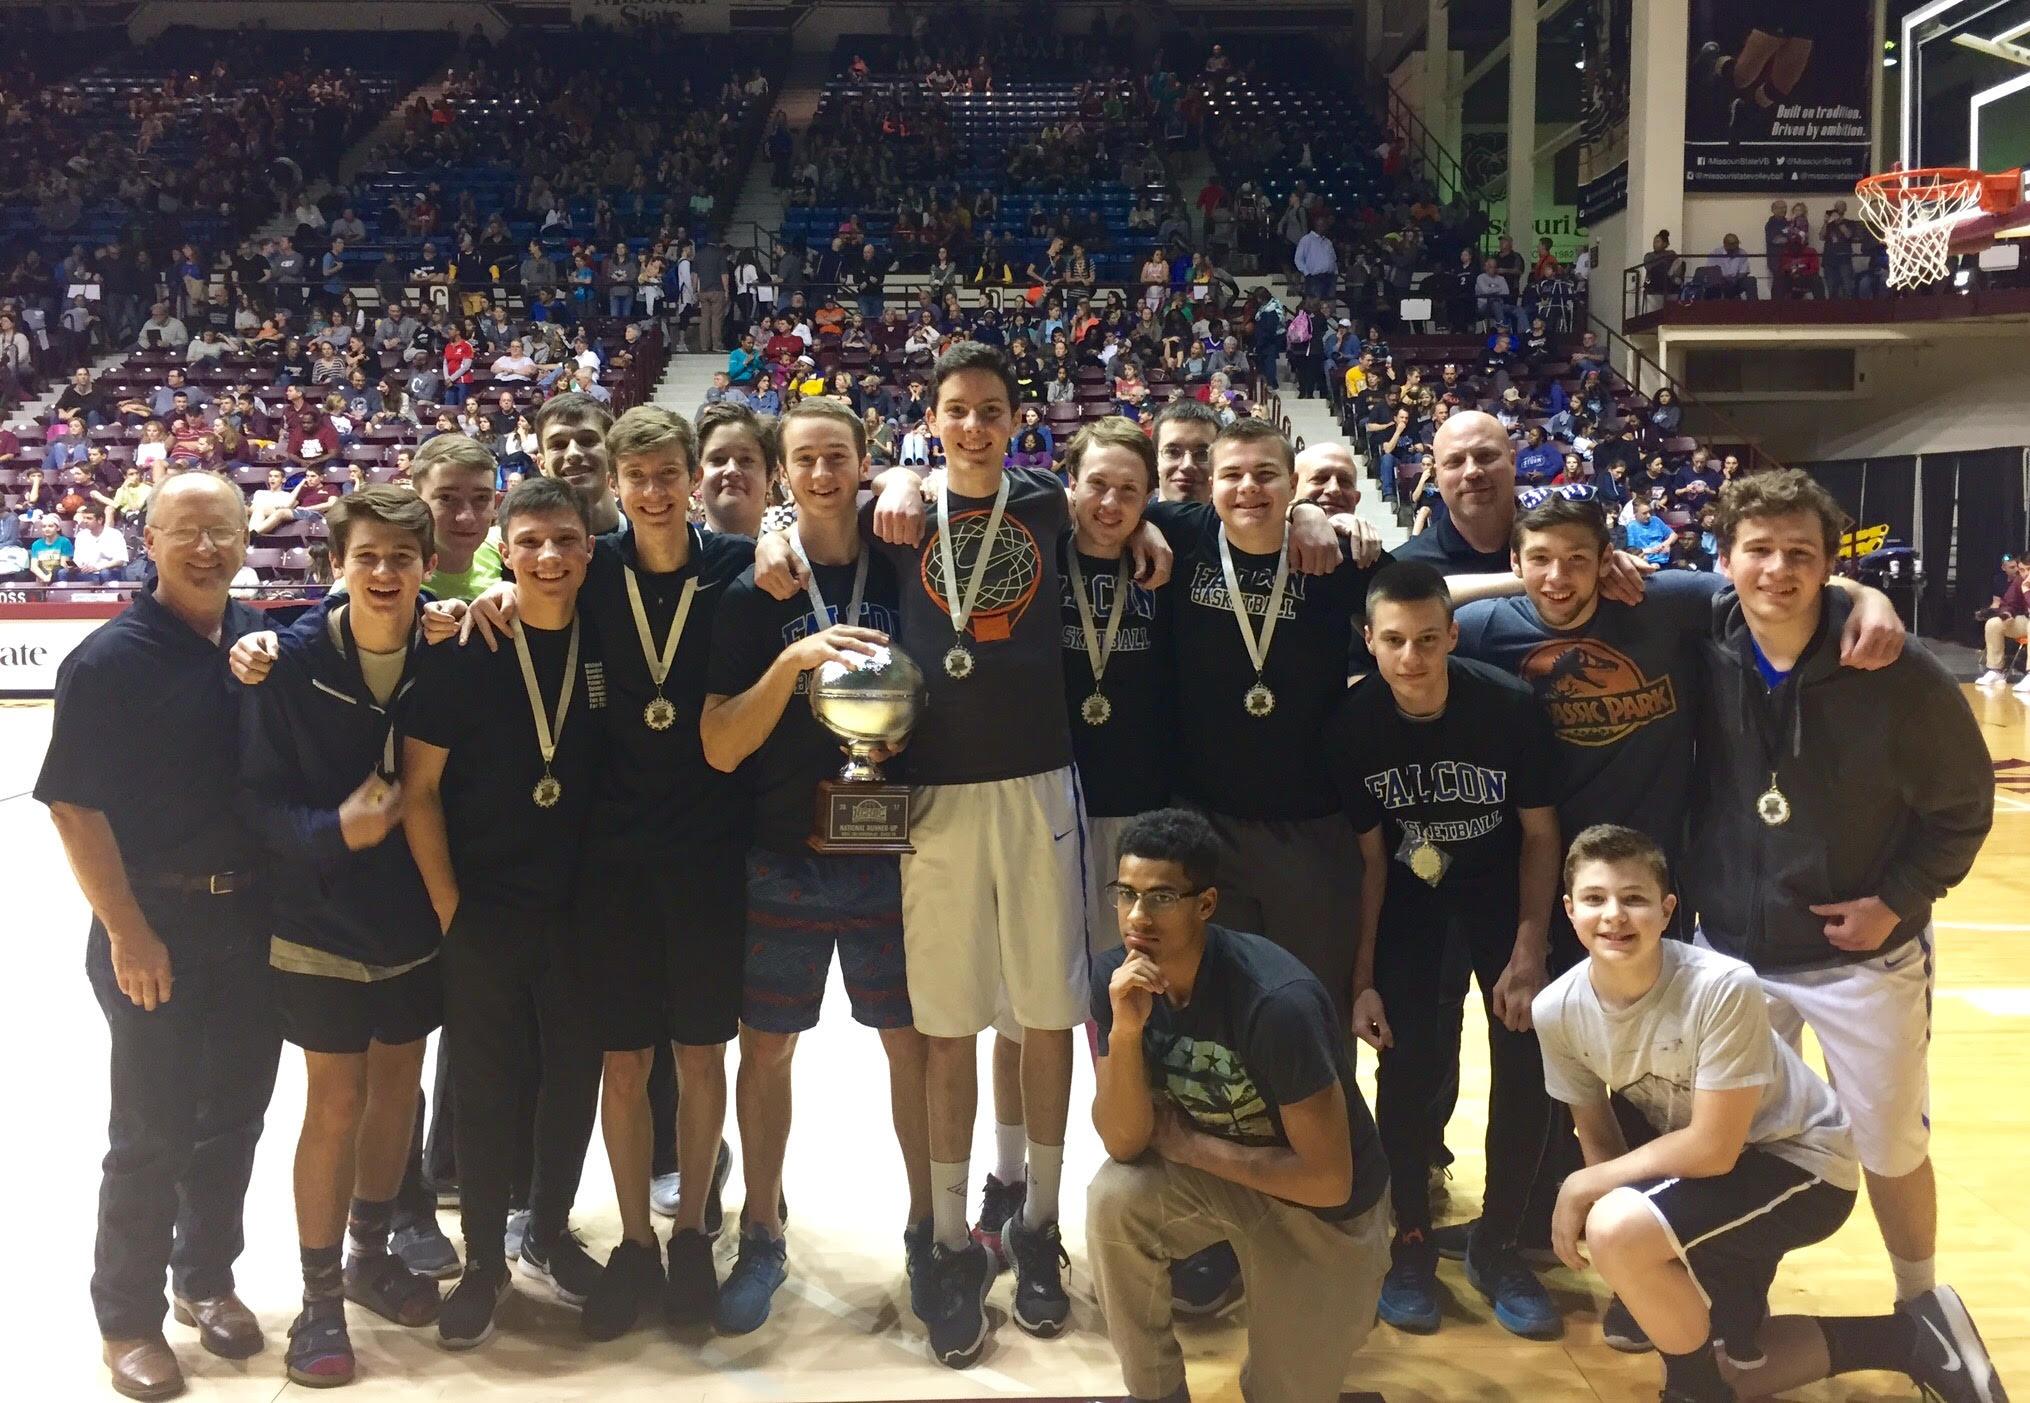 2017 18U Boys NCHBC Division III Silver Ball Champions